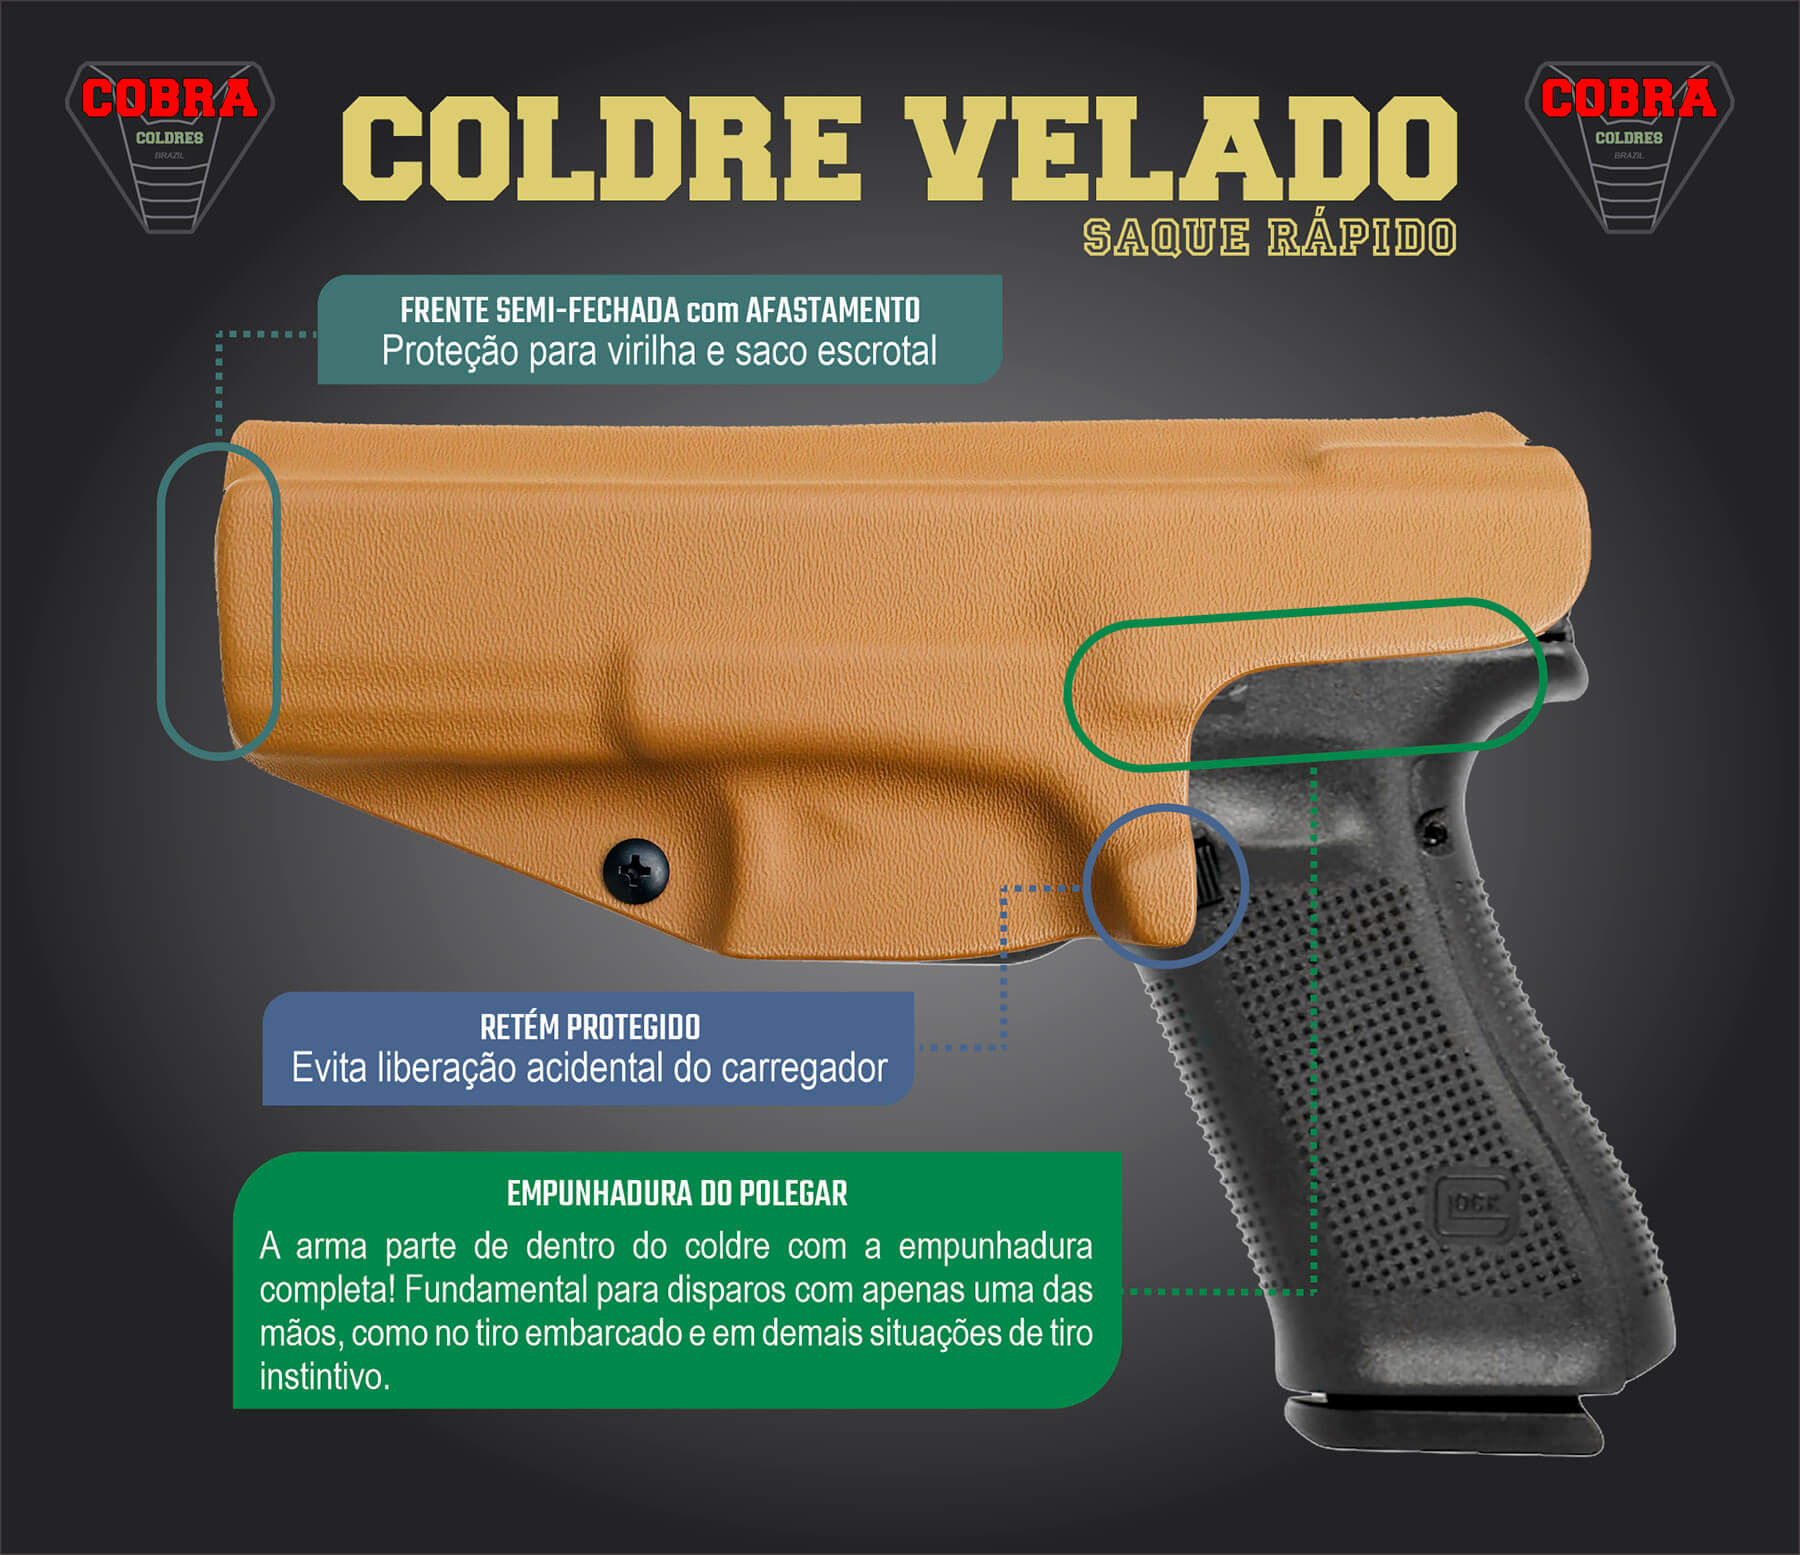 Coldre [TH9c] [TH40c] [TH380c] [PT838c] Kydex + 1 Porta-Carregador Universal - Saque Rápido Velado Kydex® 080